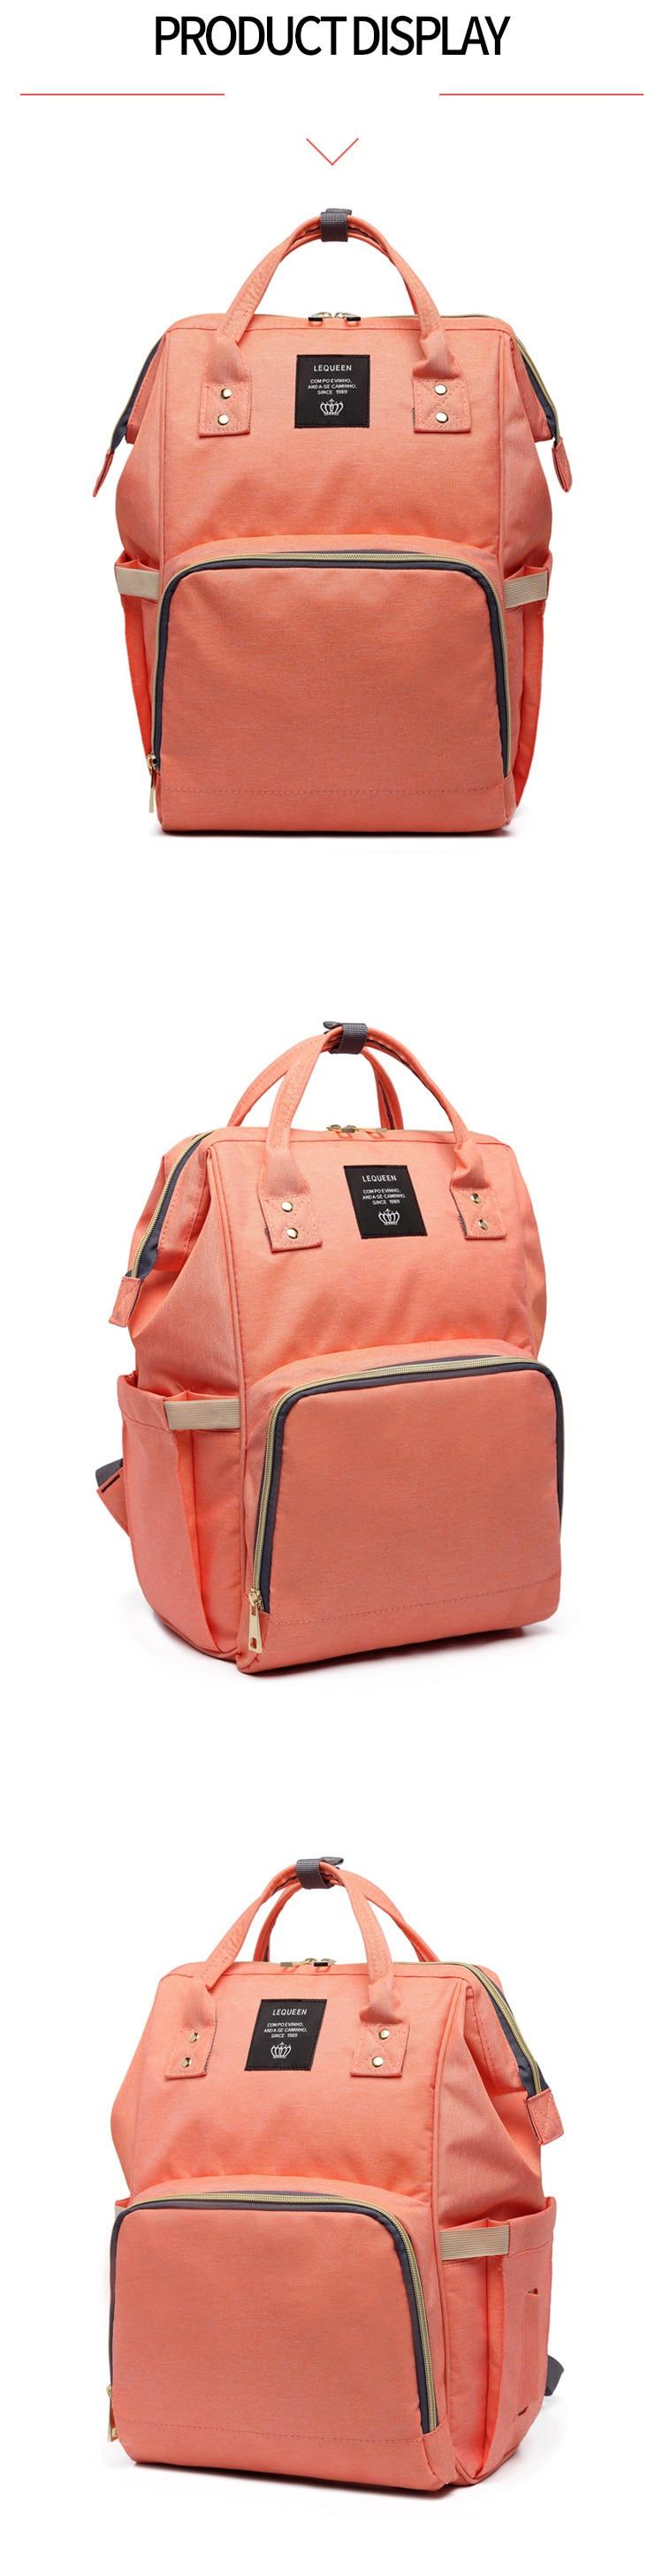 HTB1oq4yKeOSBuNjy0Fdq6zDnVXa9 Lequeen Fashion Mummy Maternity Nappy Bag Large Capacity Nappy Bag Travel Backpack Nursing Bag for Baby Care Women's Fashion Bag